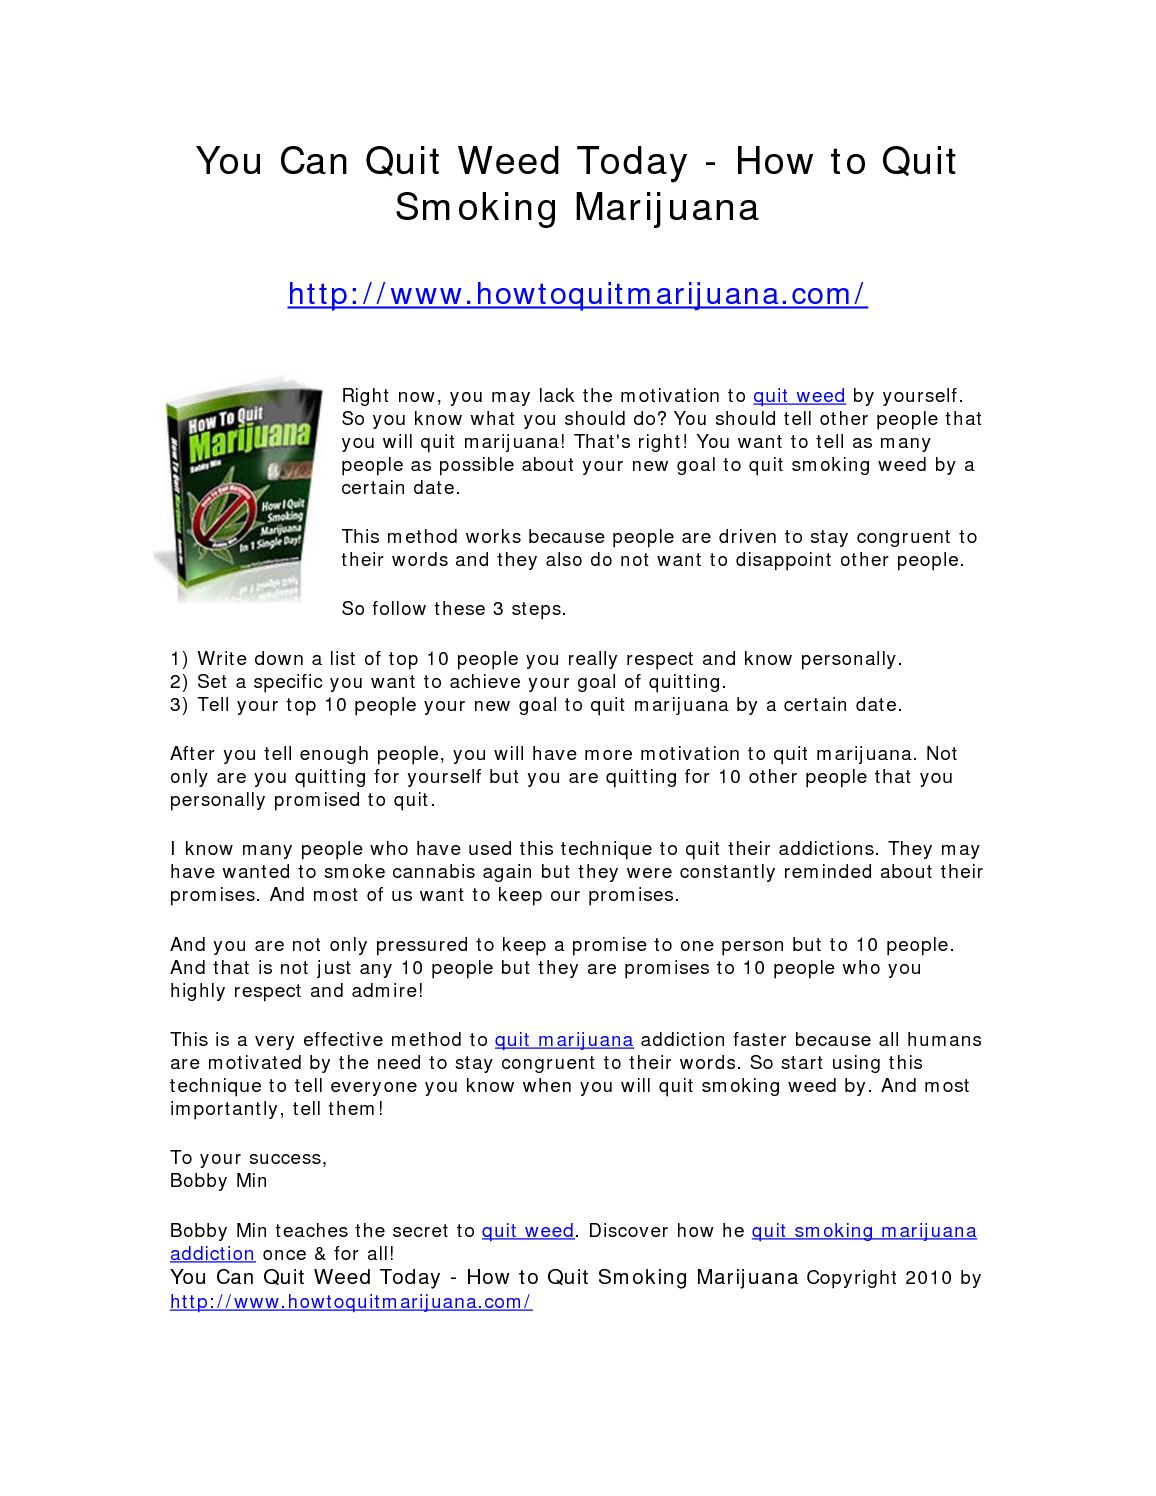 Dating someone with marijuana addiction